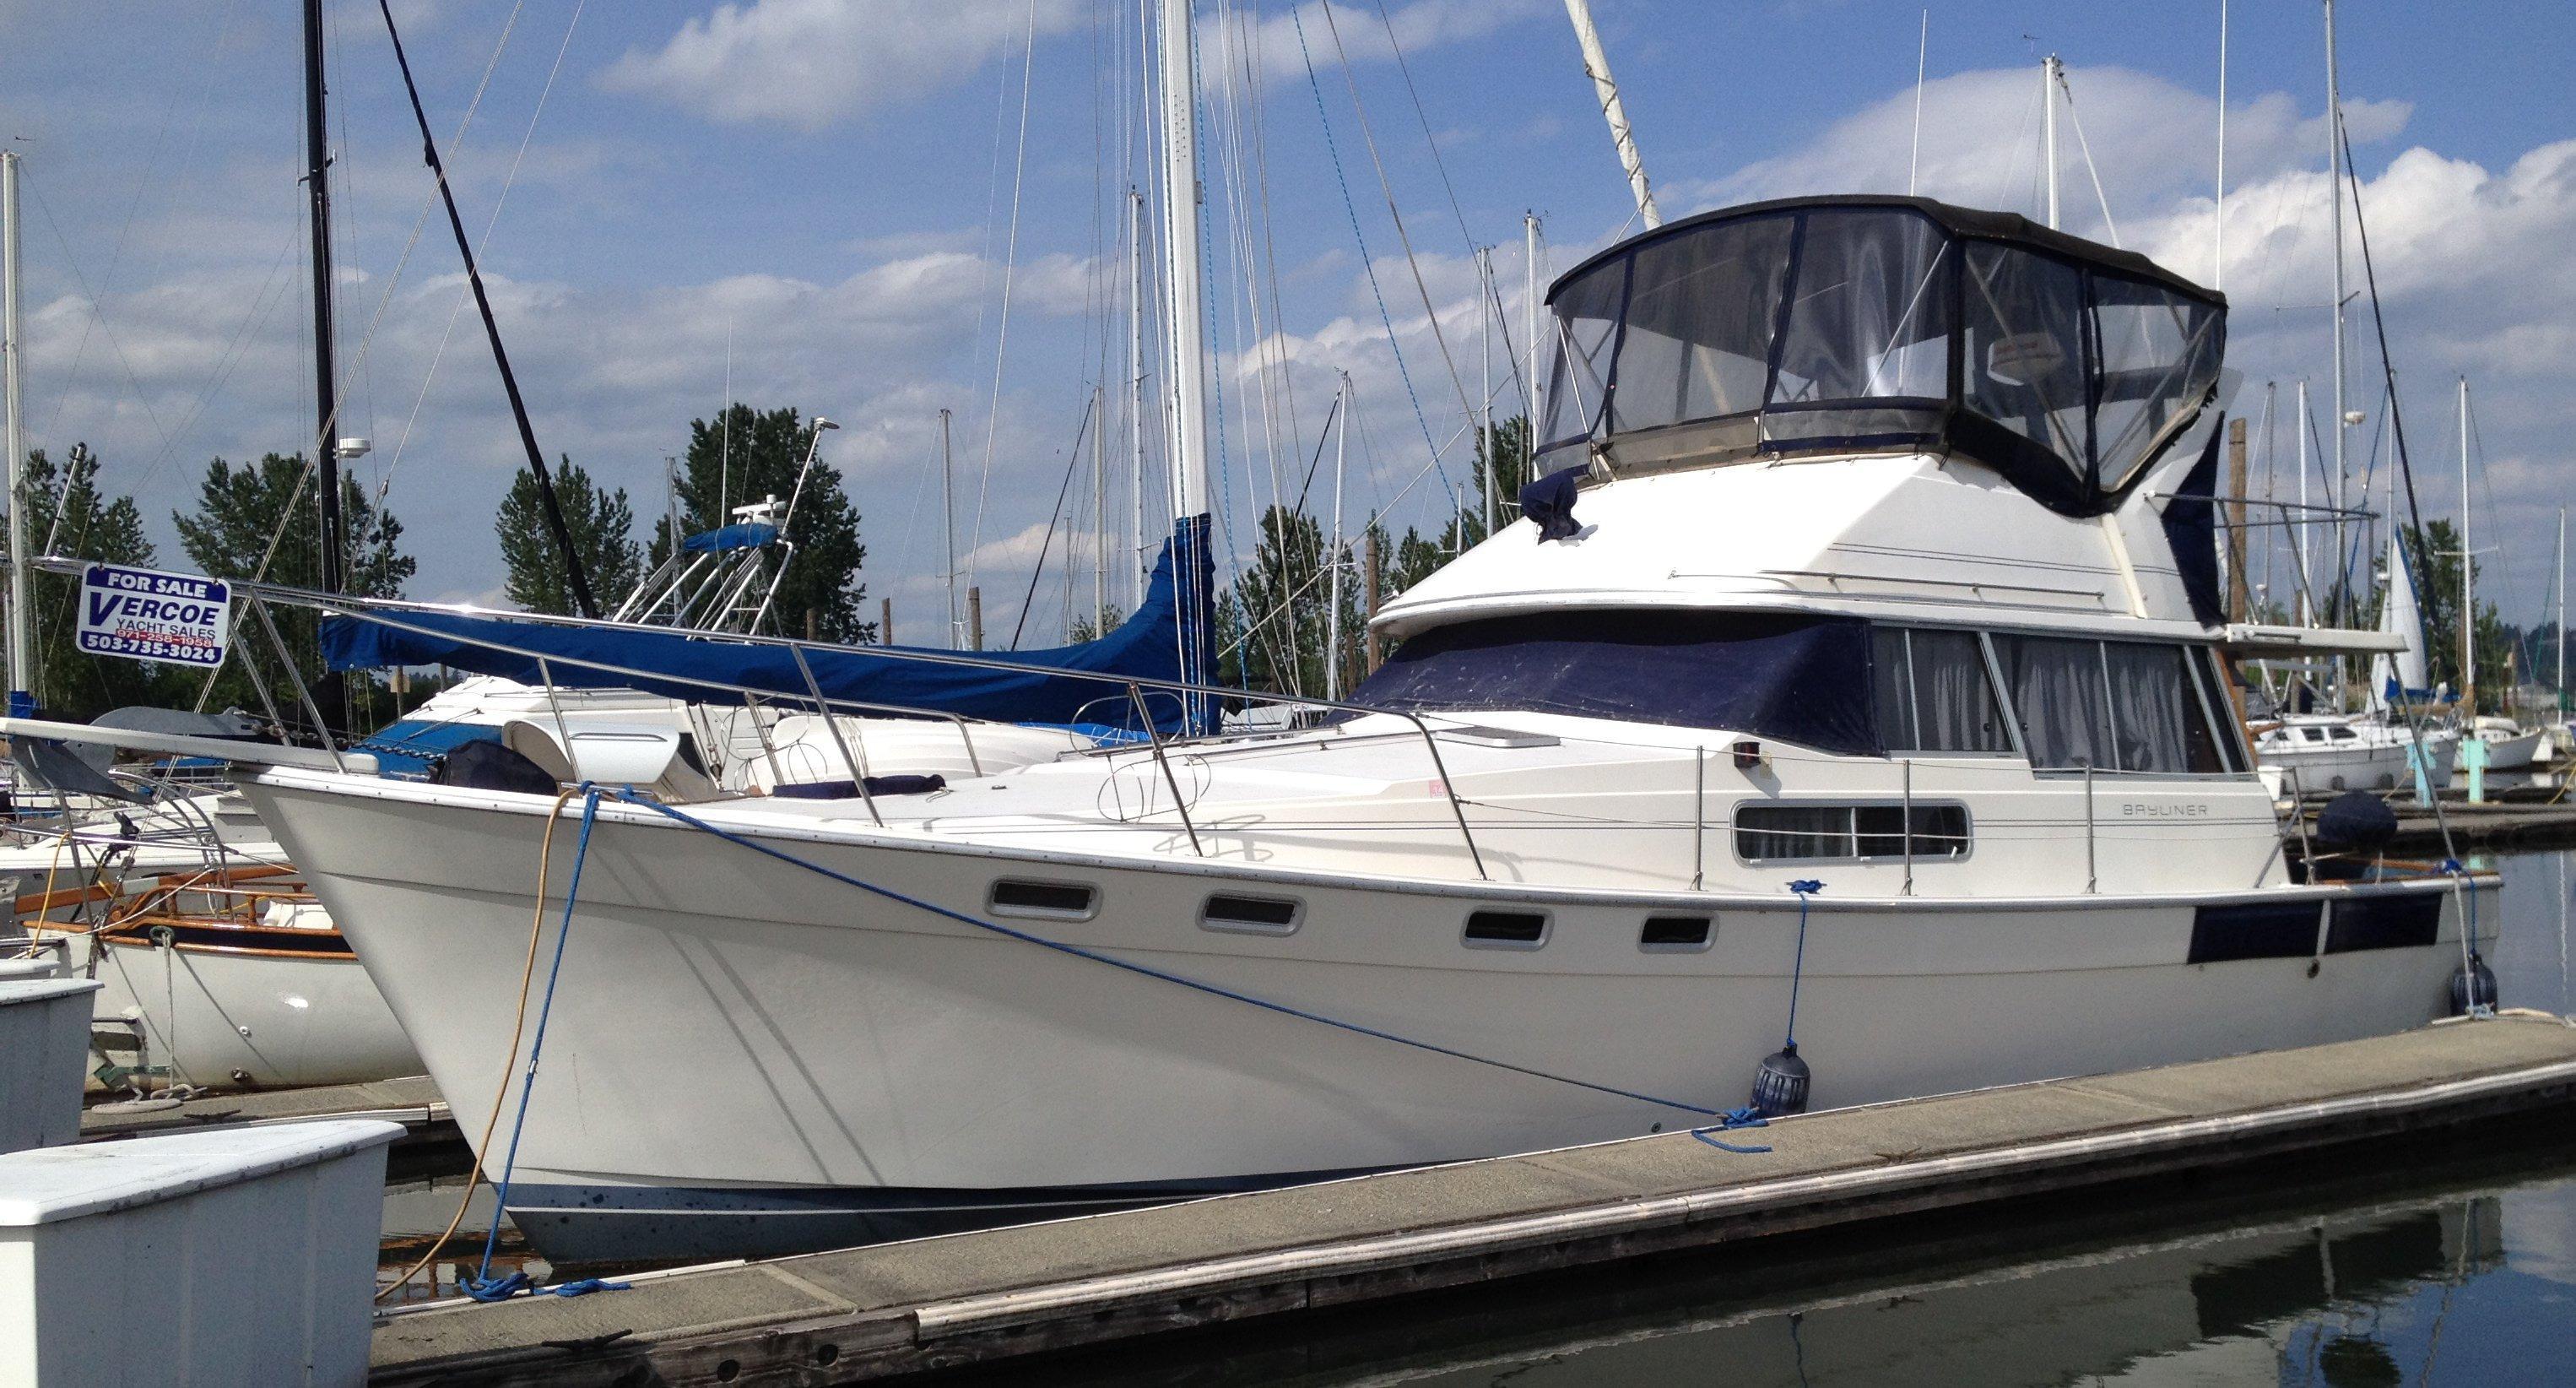 Motor Yacht Boat Listings In Or